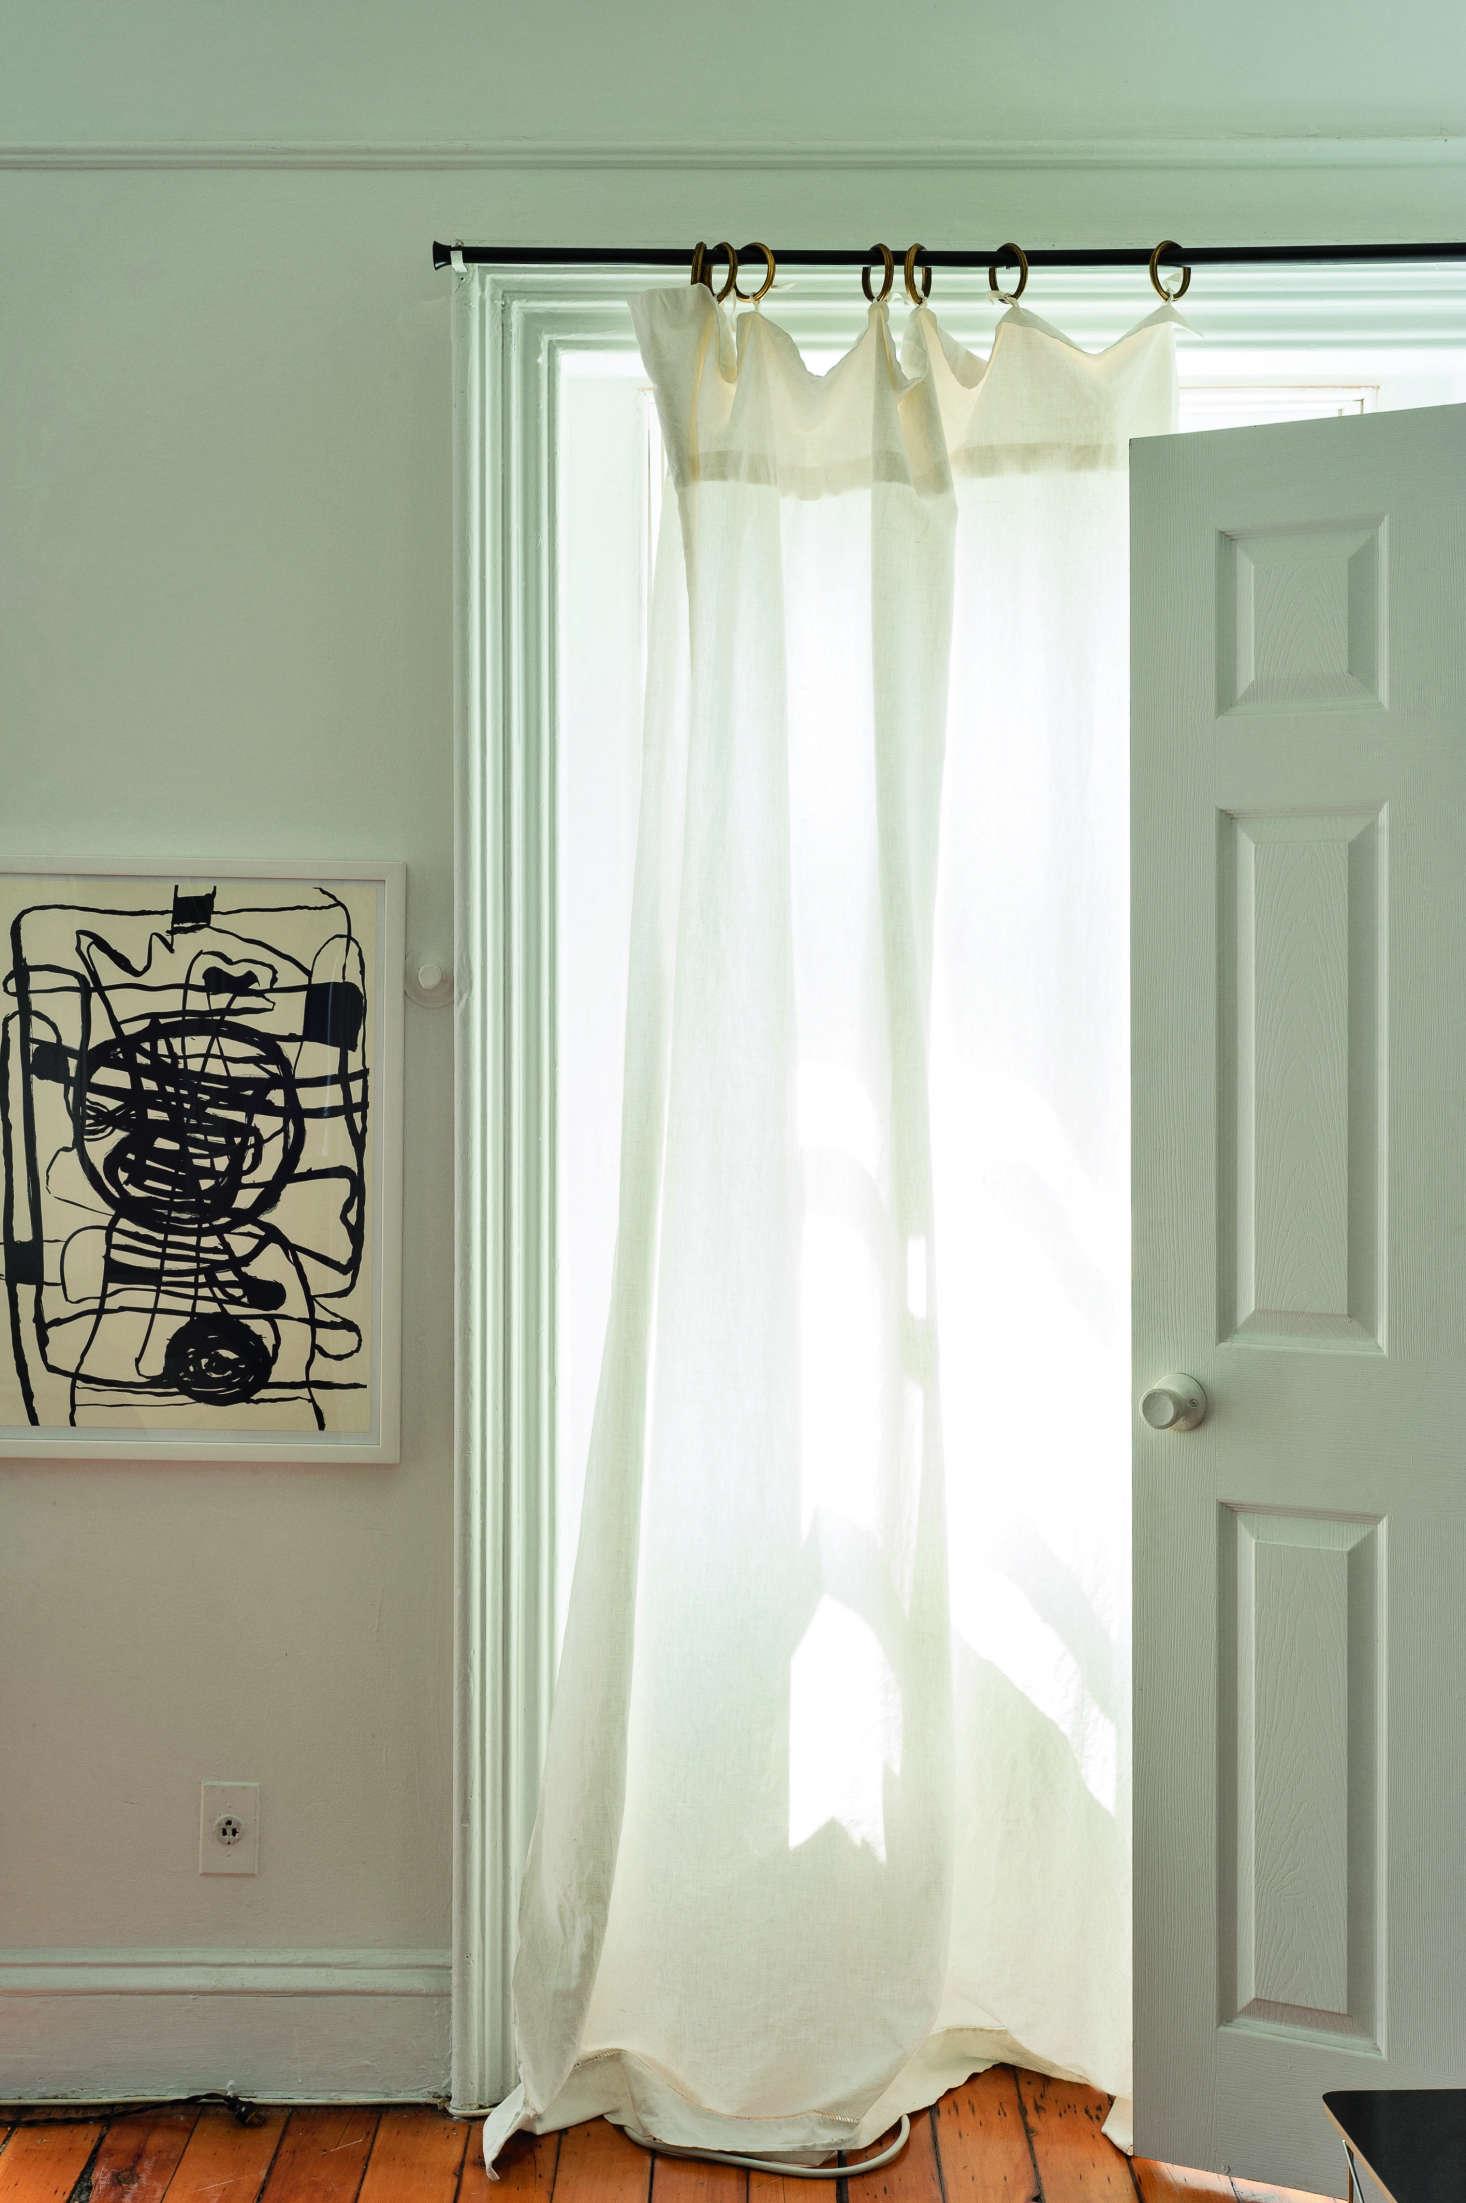 9 Favorites Floor-To-Ceiling Sheer Summer Curtains - Remodelista-7829